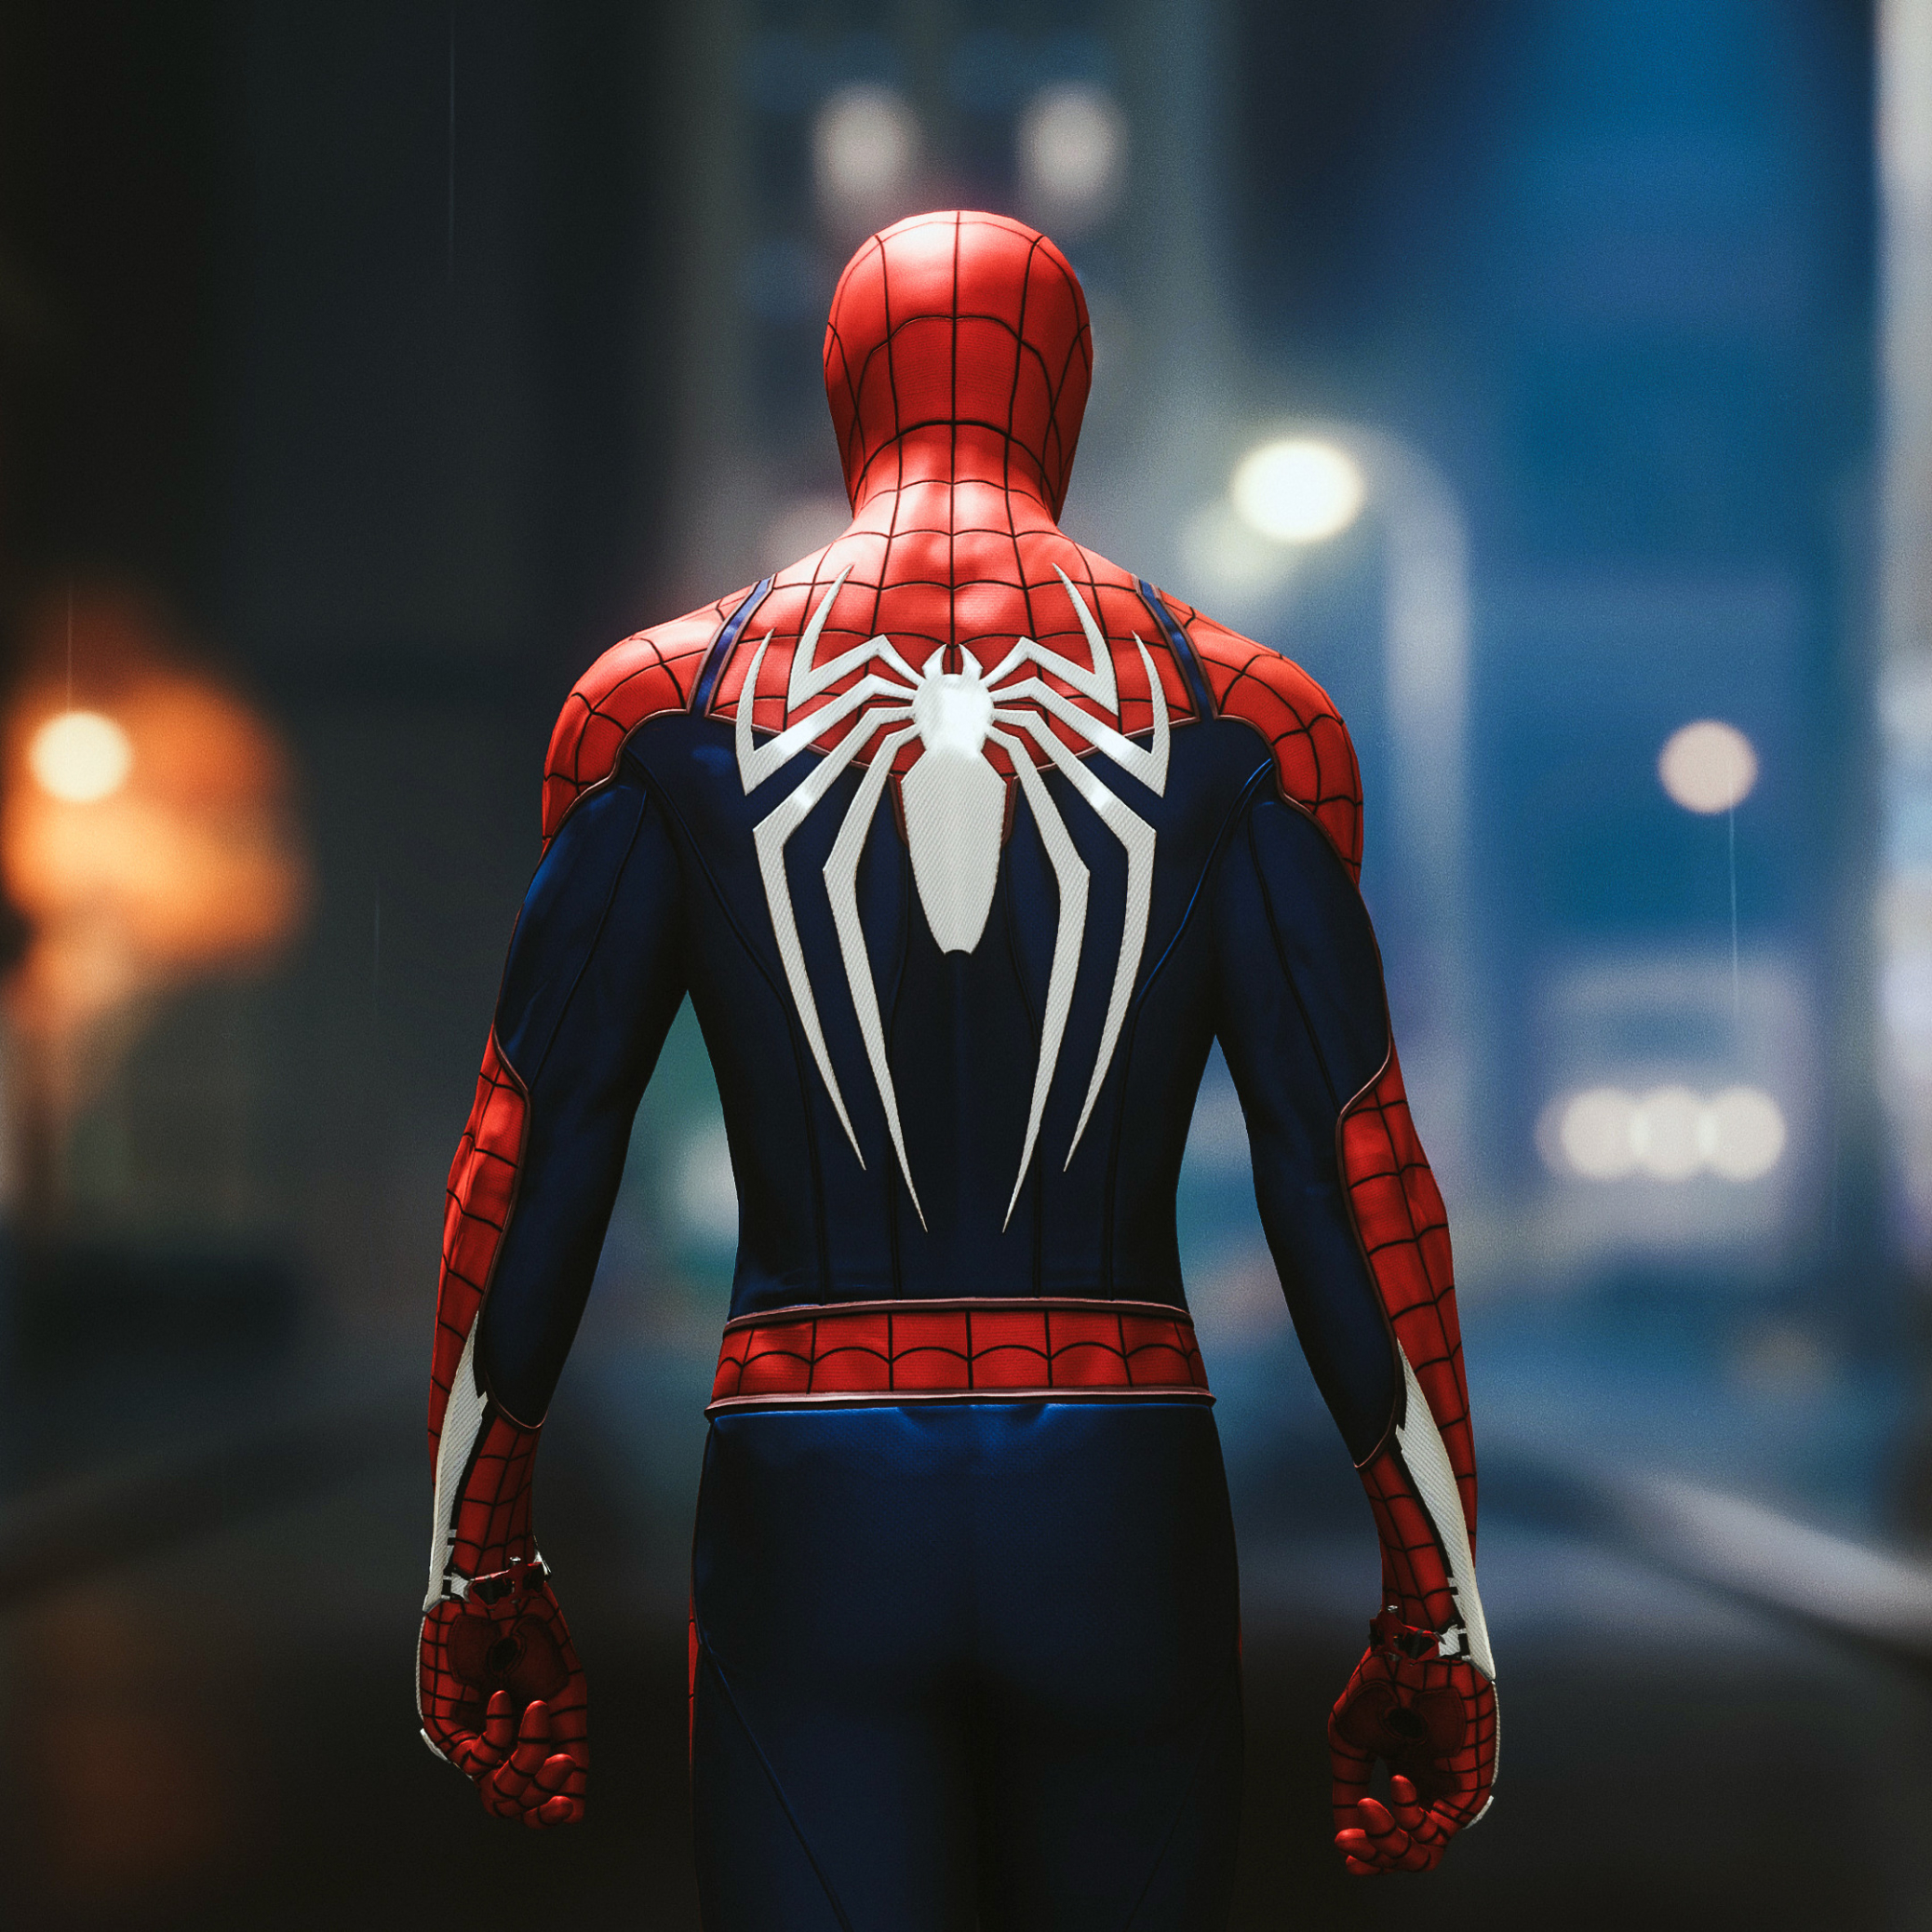 Spider-Man (PS4) Advanced Suit Forum Avatar | Profile Photo